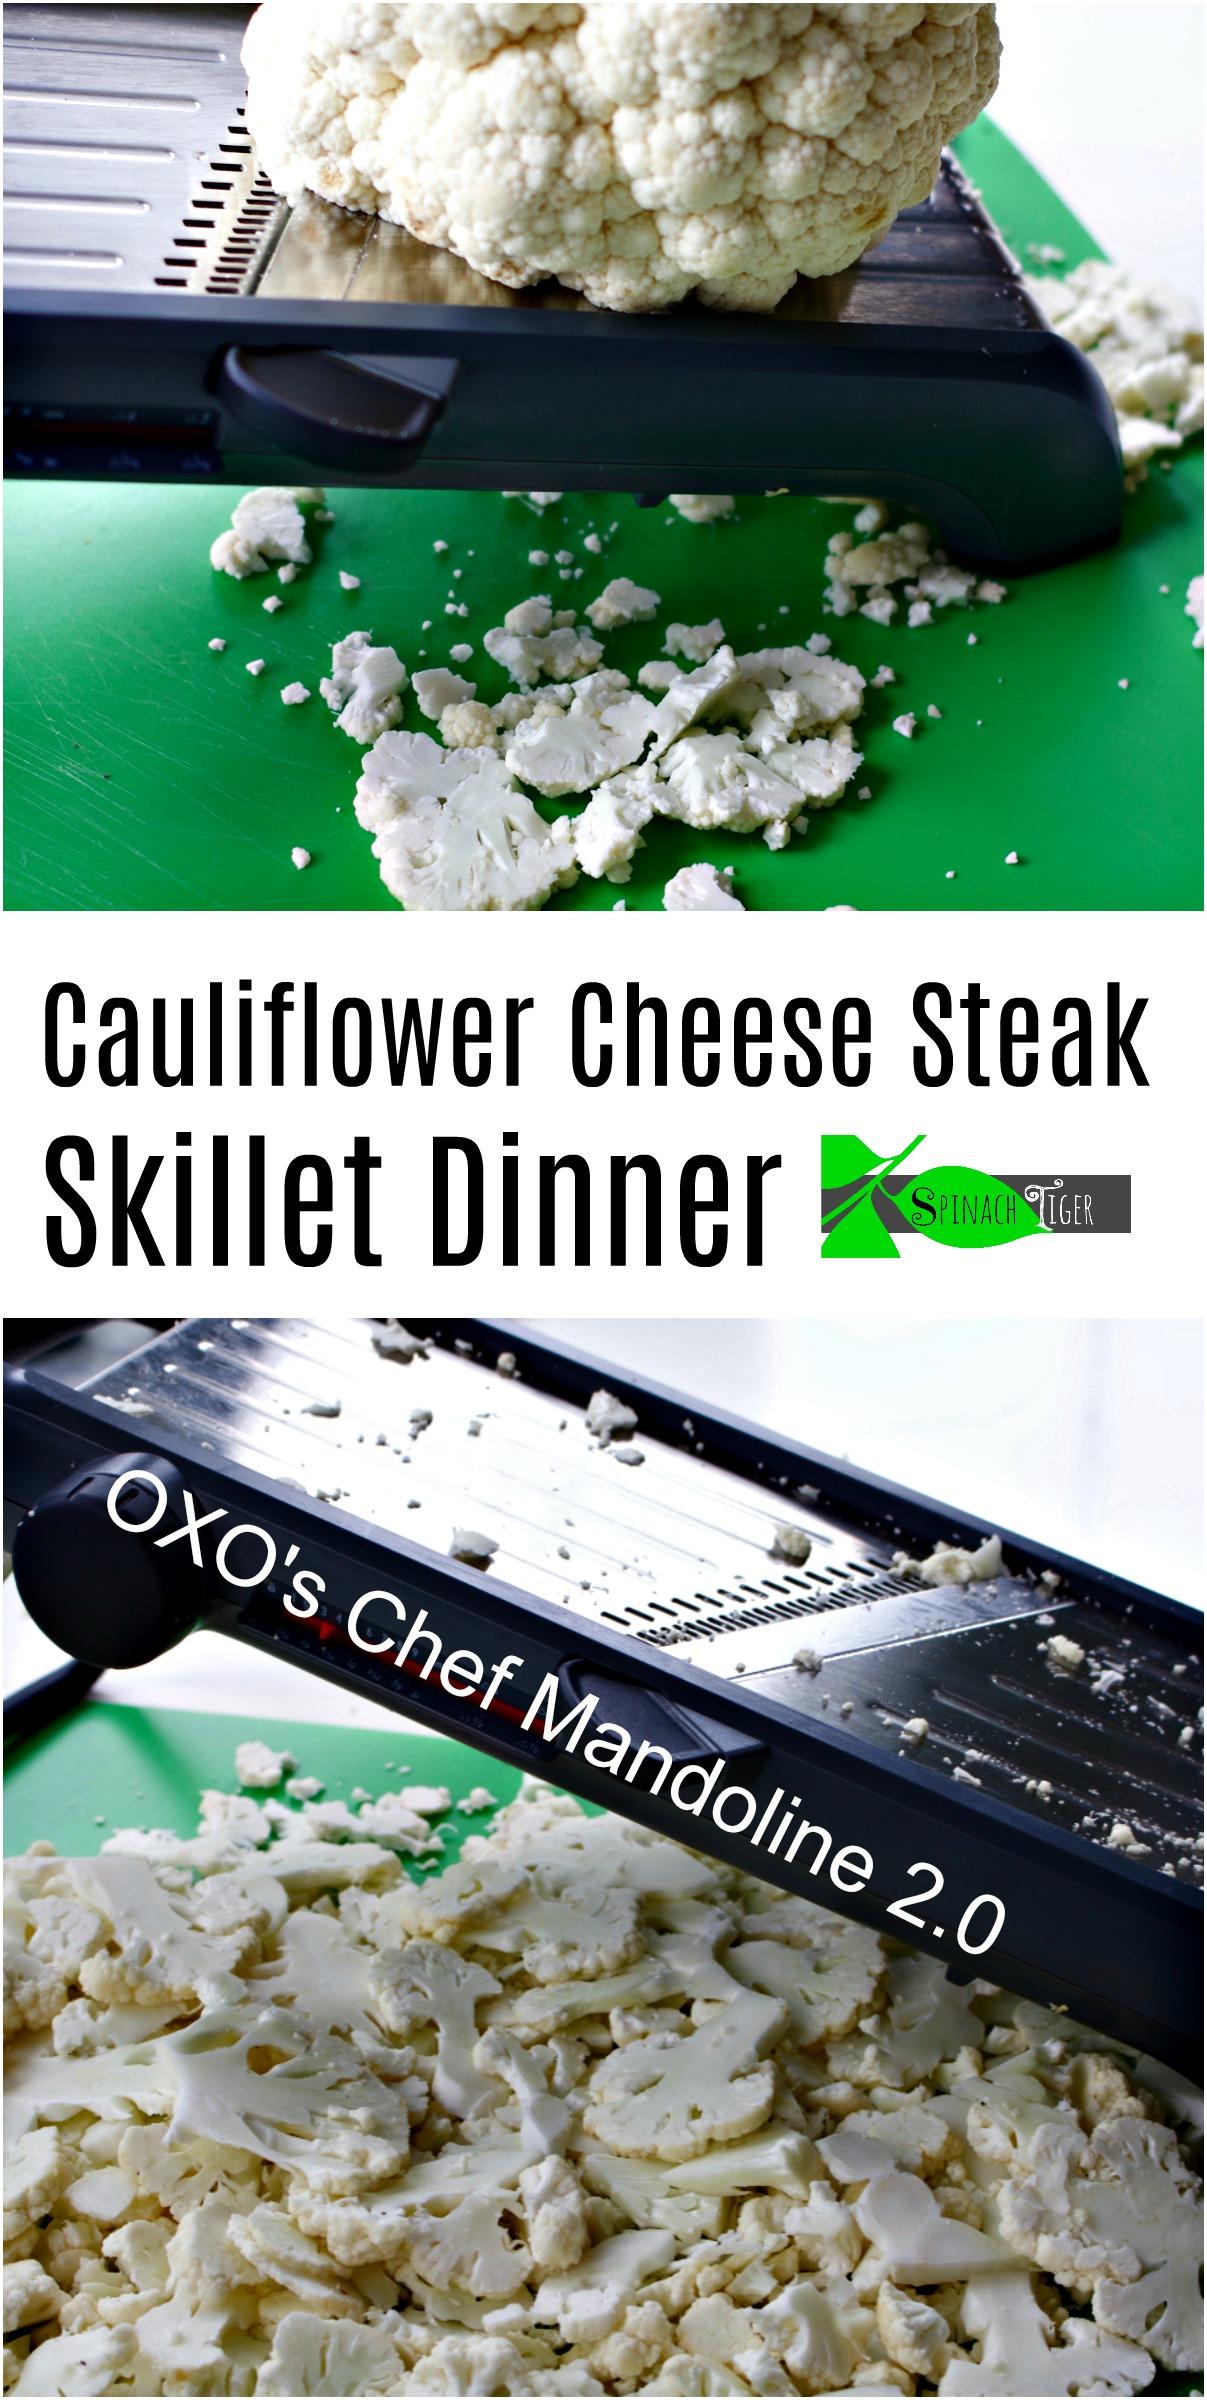 OXO Chef Mandoline 2.0